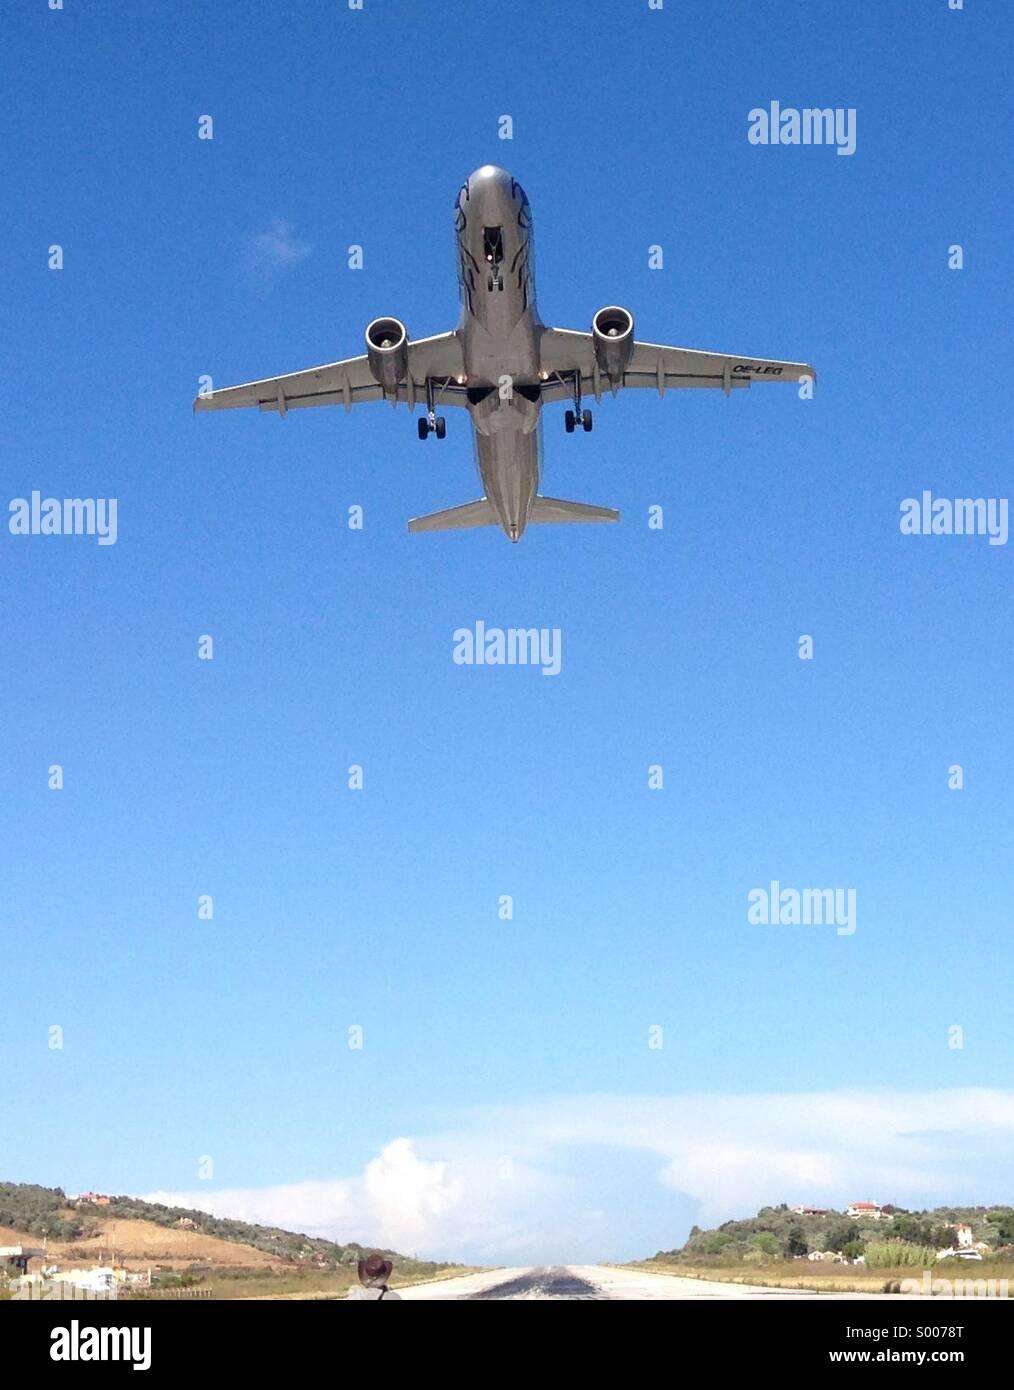 Flight - Stock Image